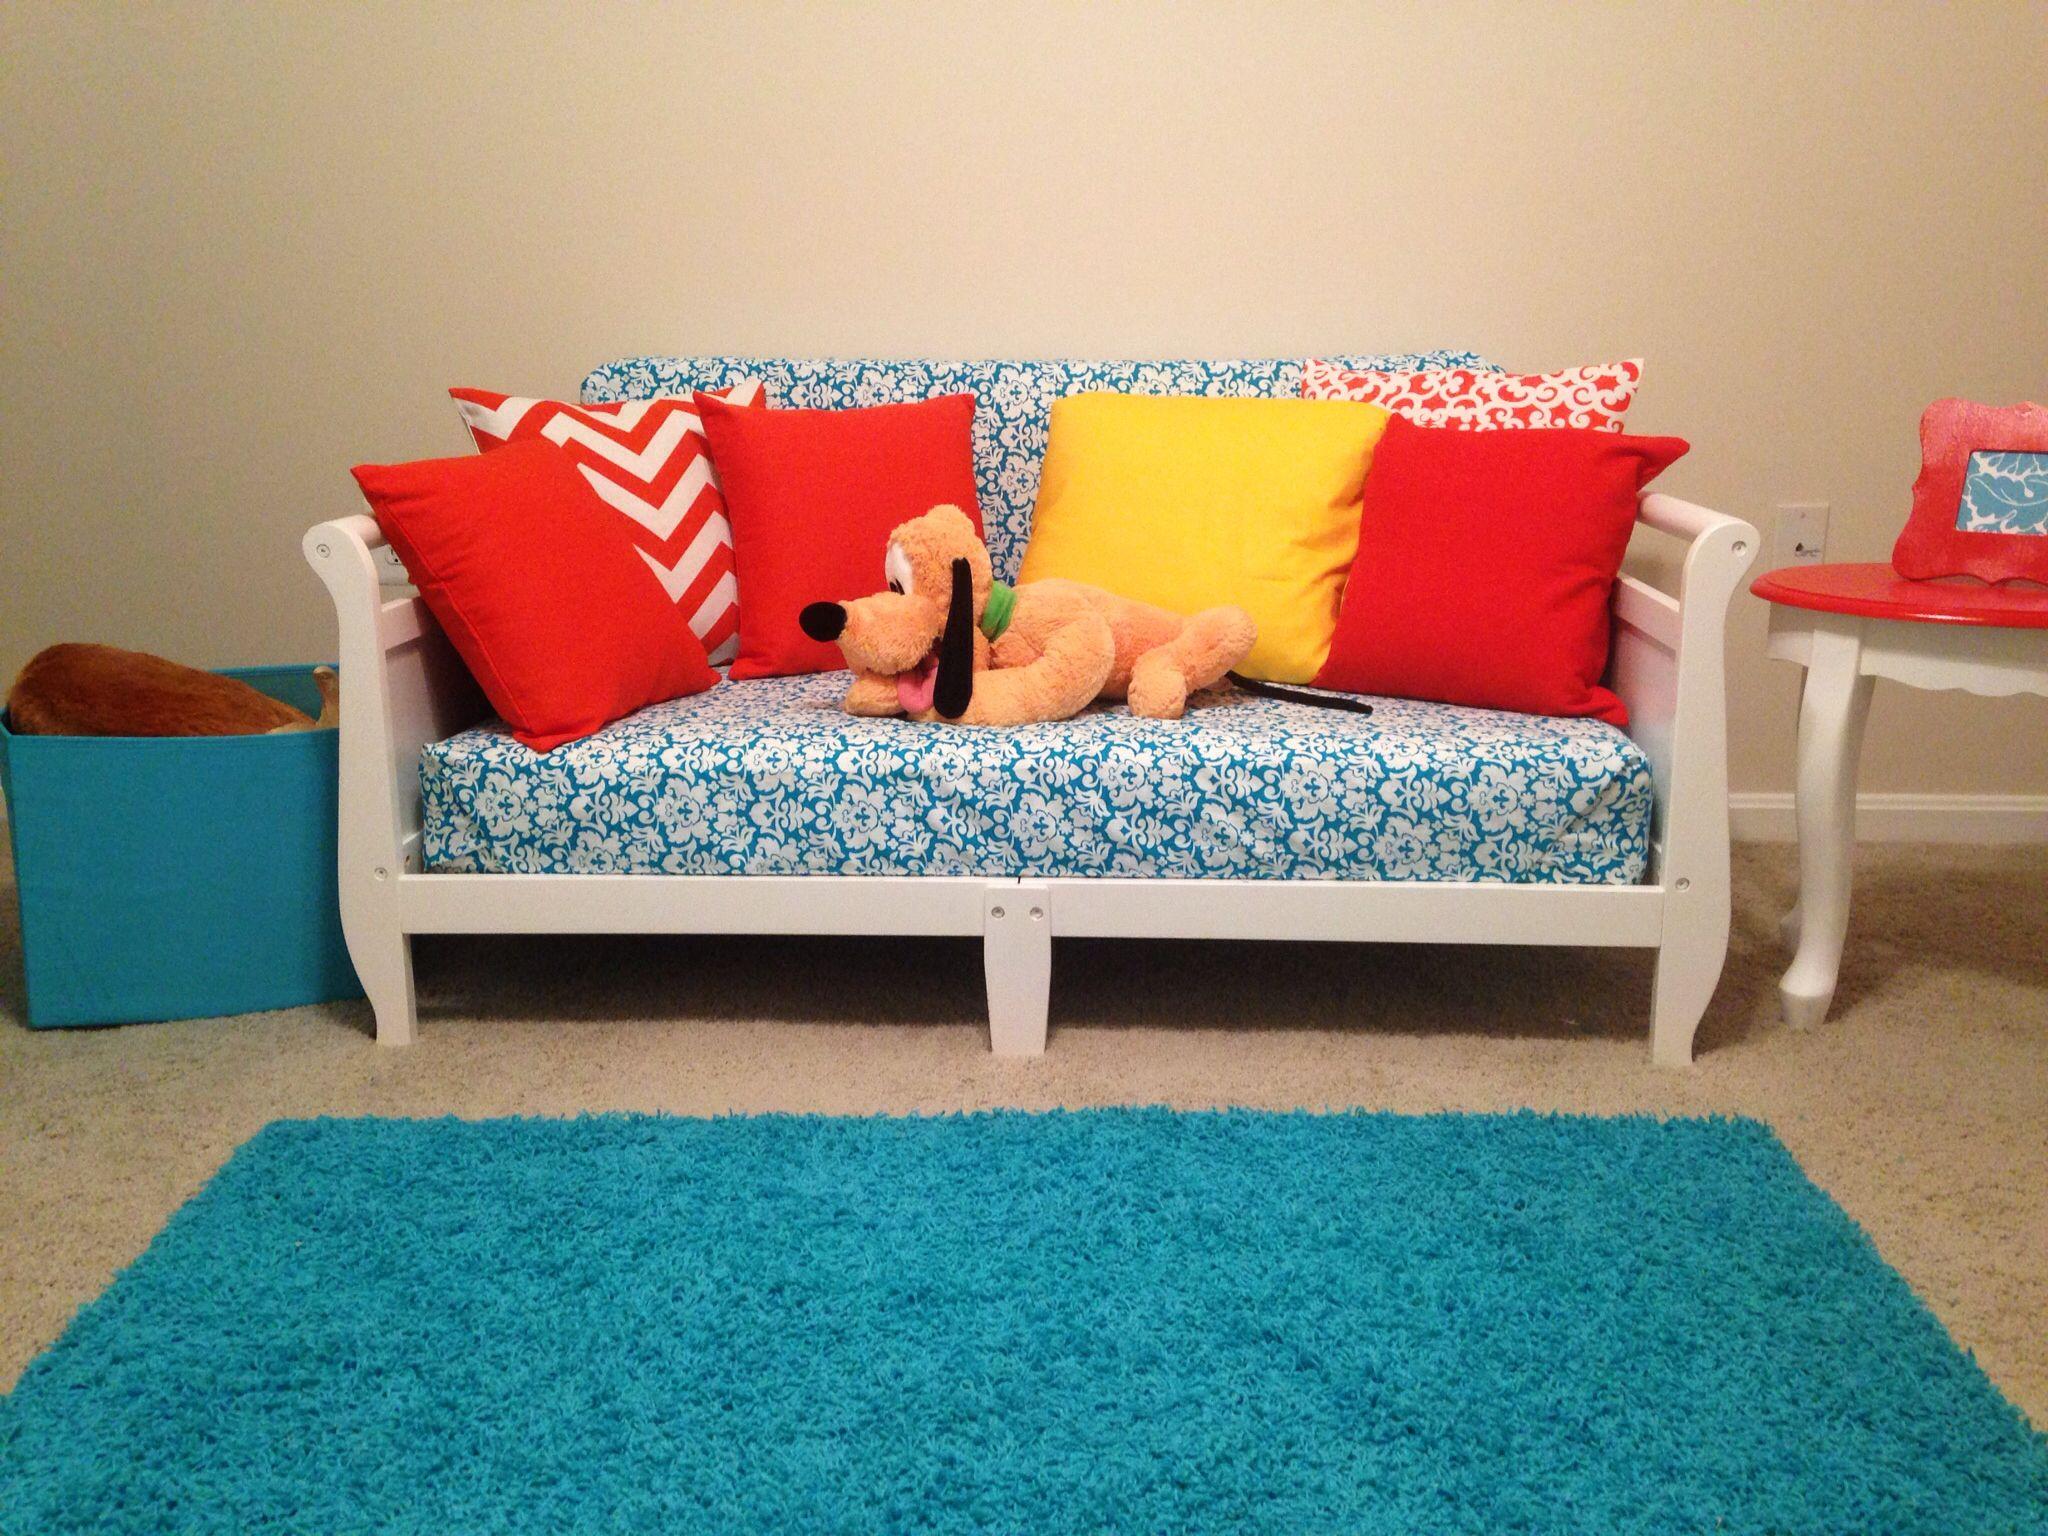 Upcycling Playroom Sofa From Toddler Beds Toddler Sofa Diy